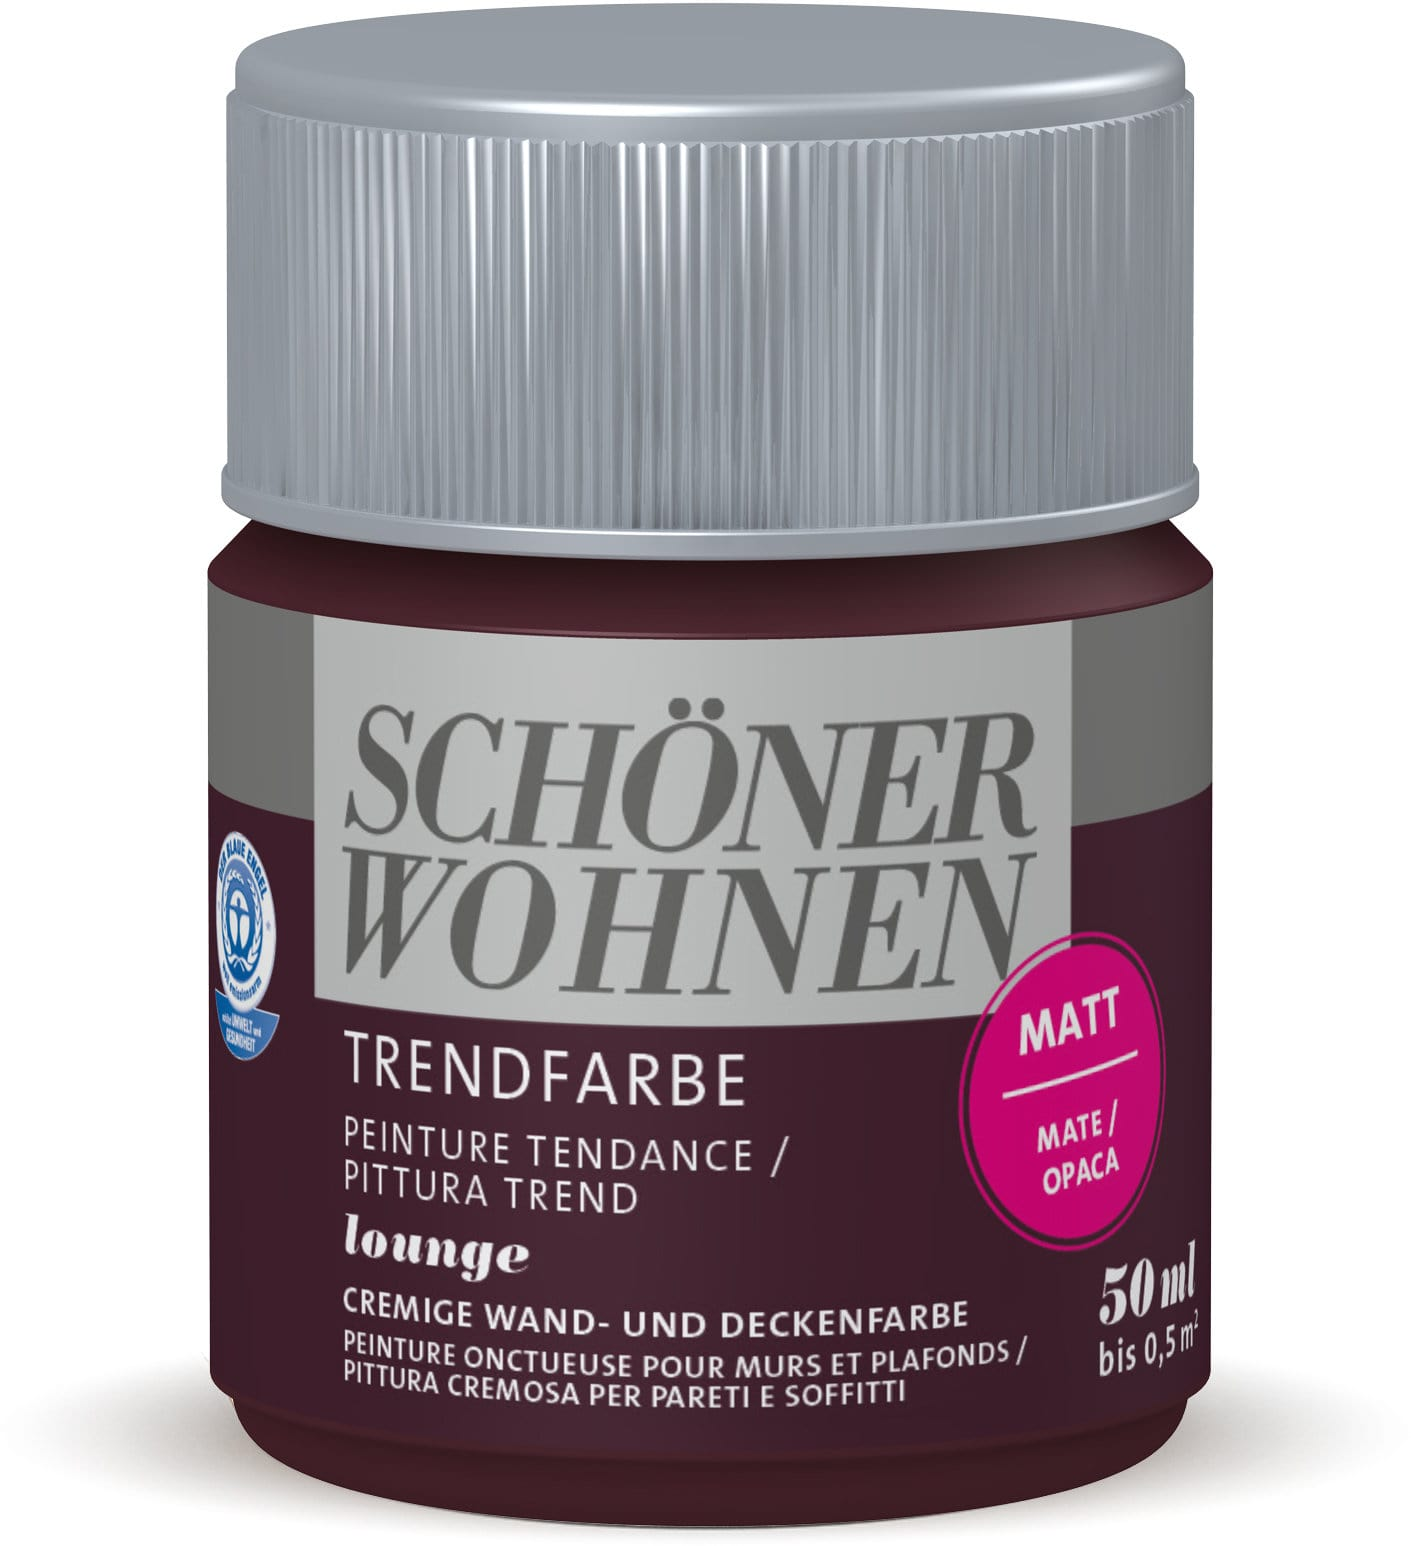 Schöner Wohnen Testeur de couleur tendance Lounge 50 ml